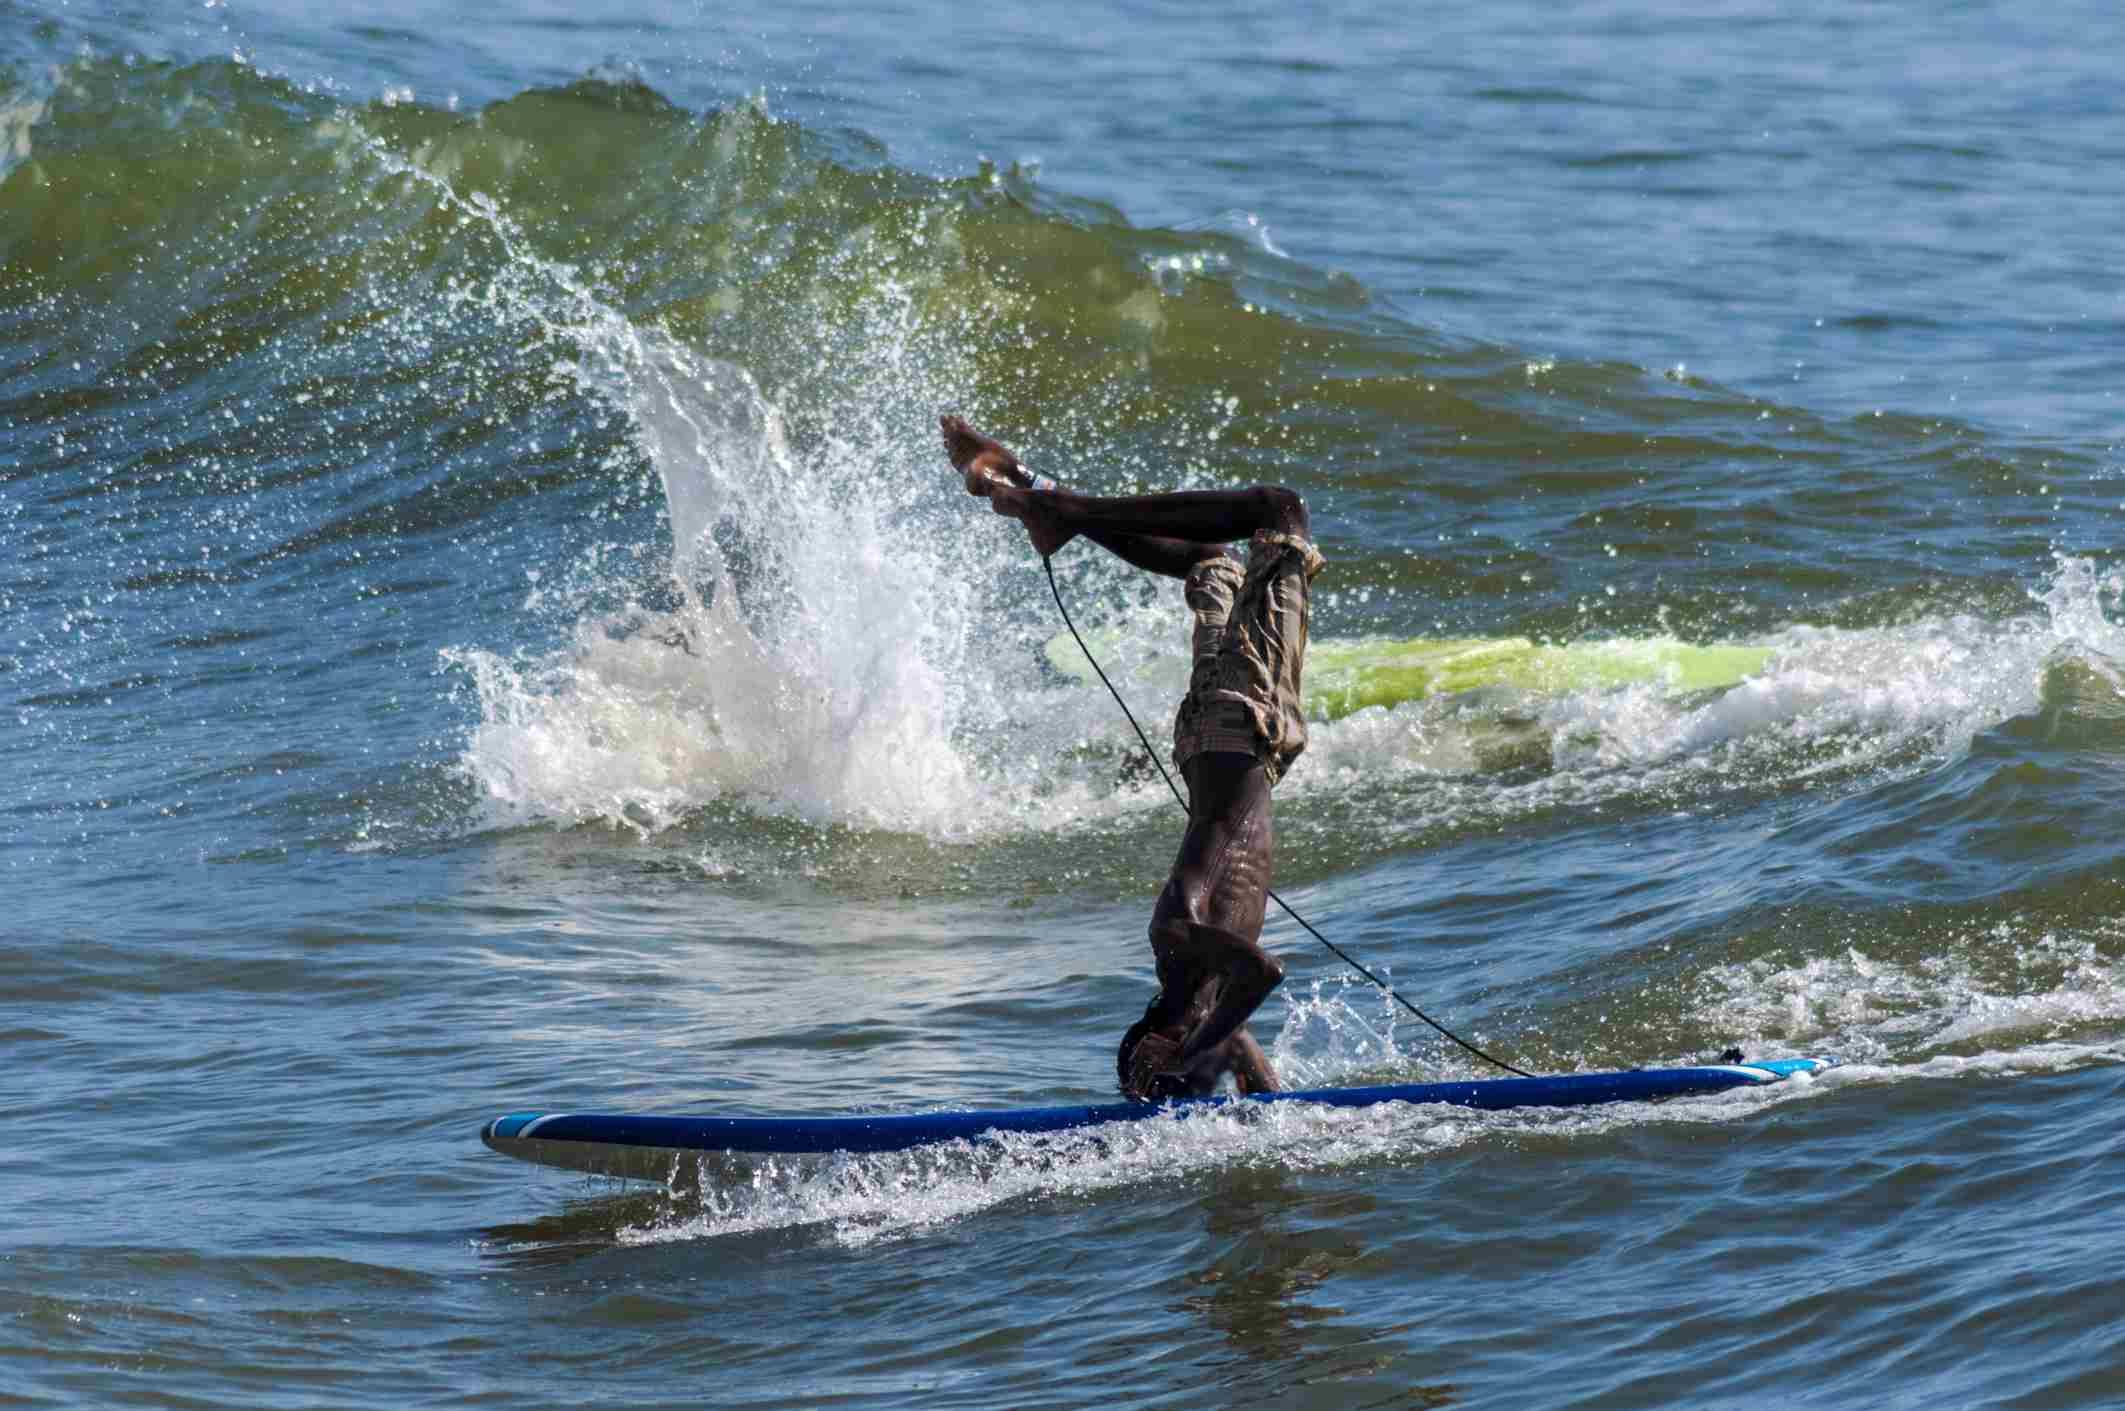 Surfer at Kovalam, Tamil Nadu.